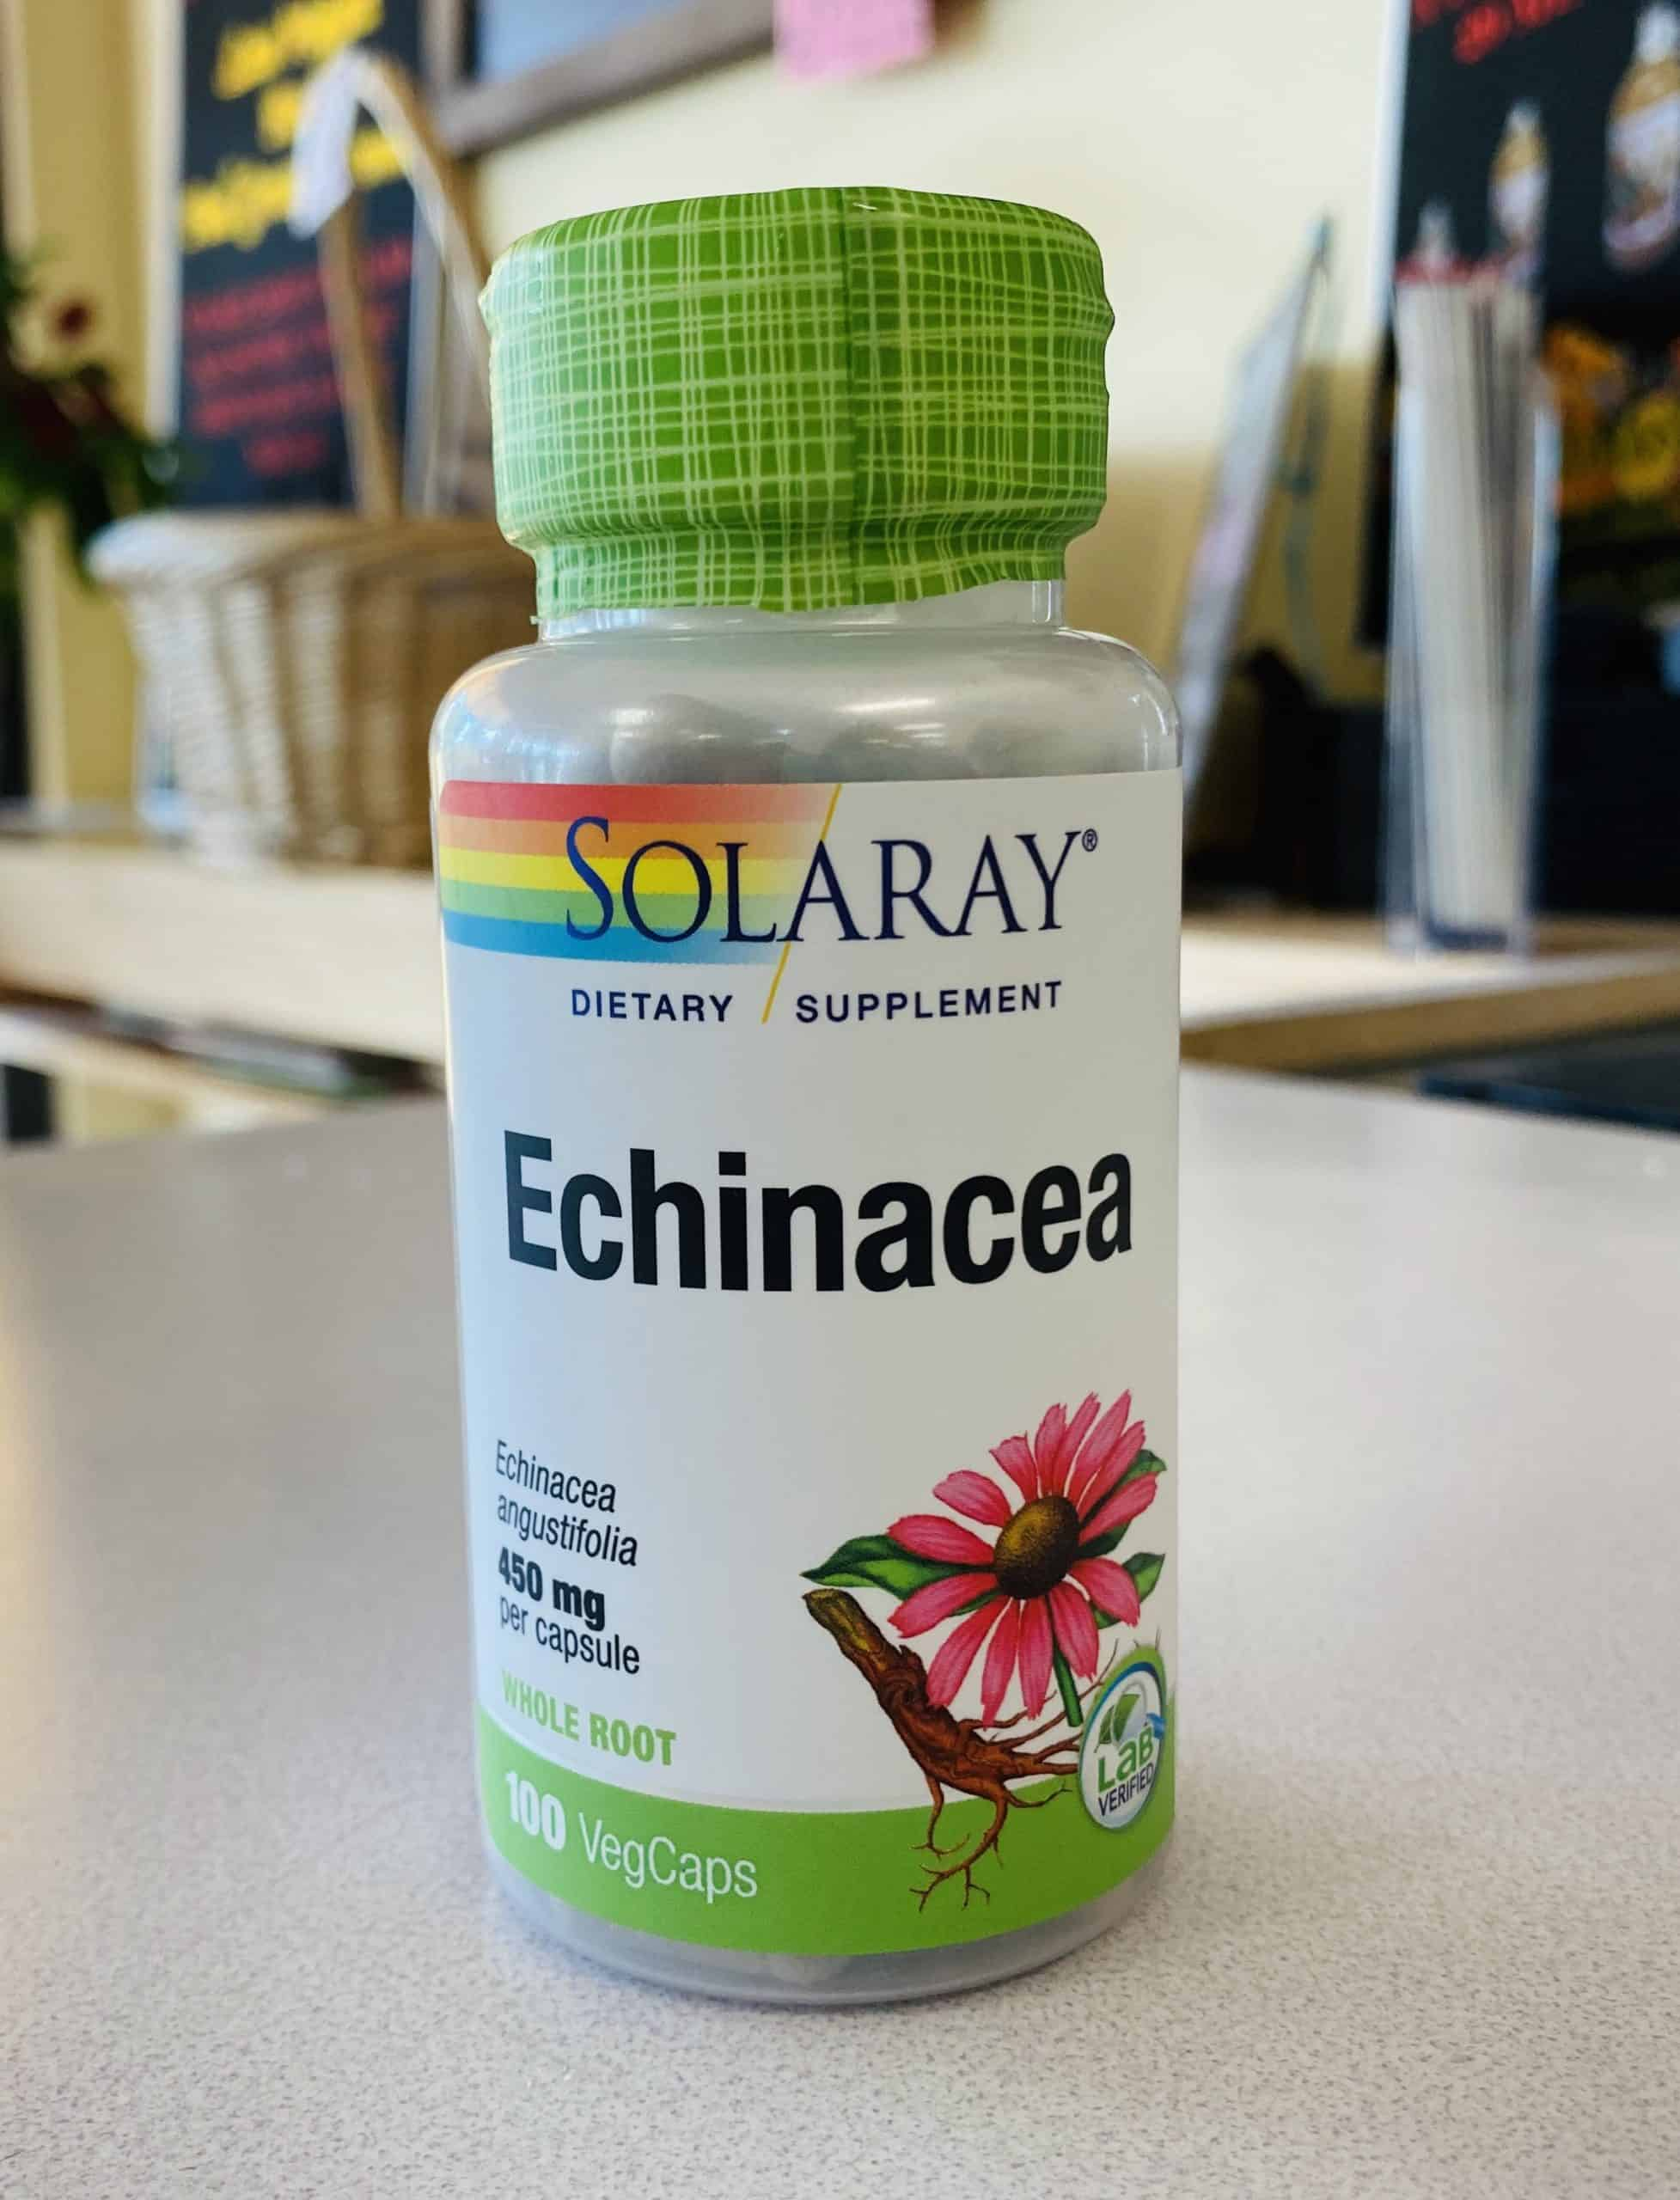 Soloray - Echinacea